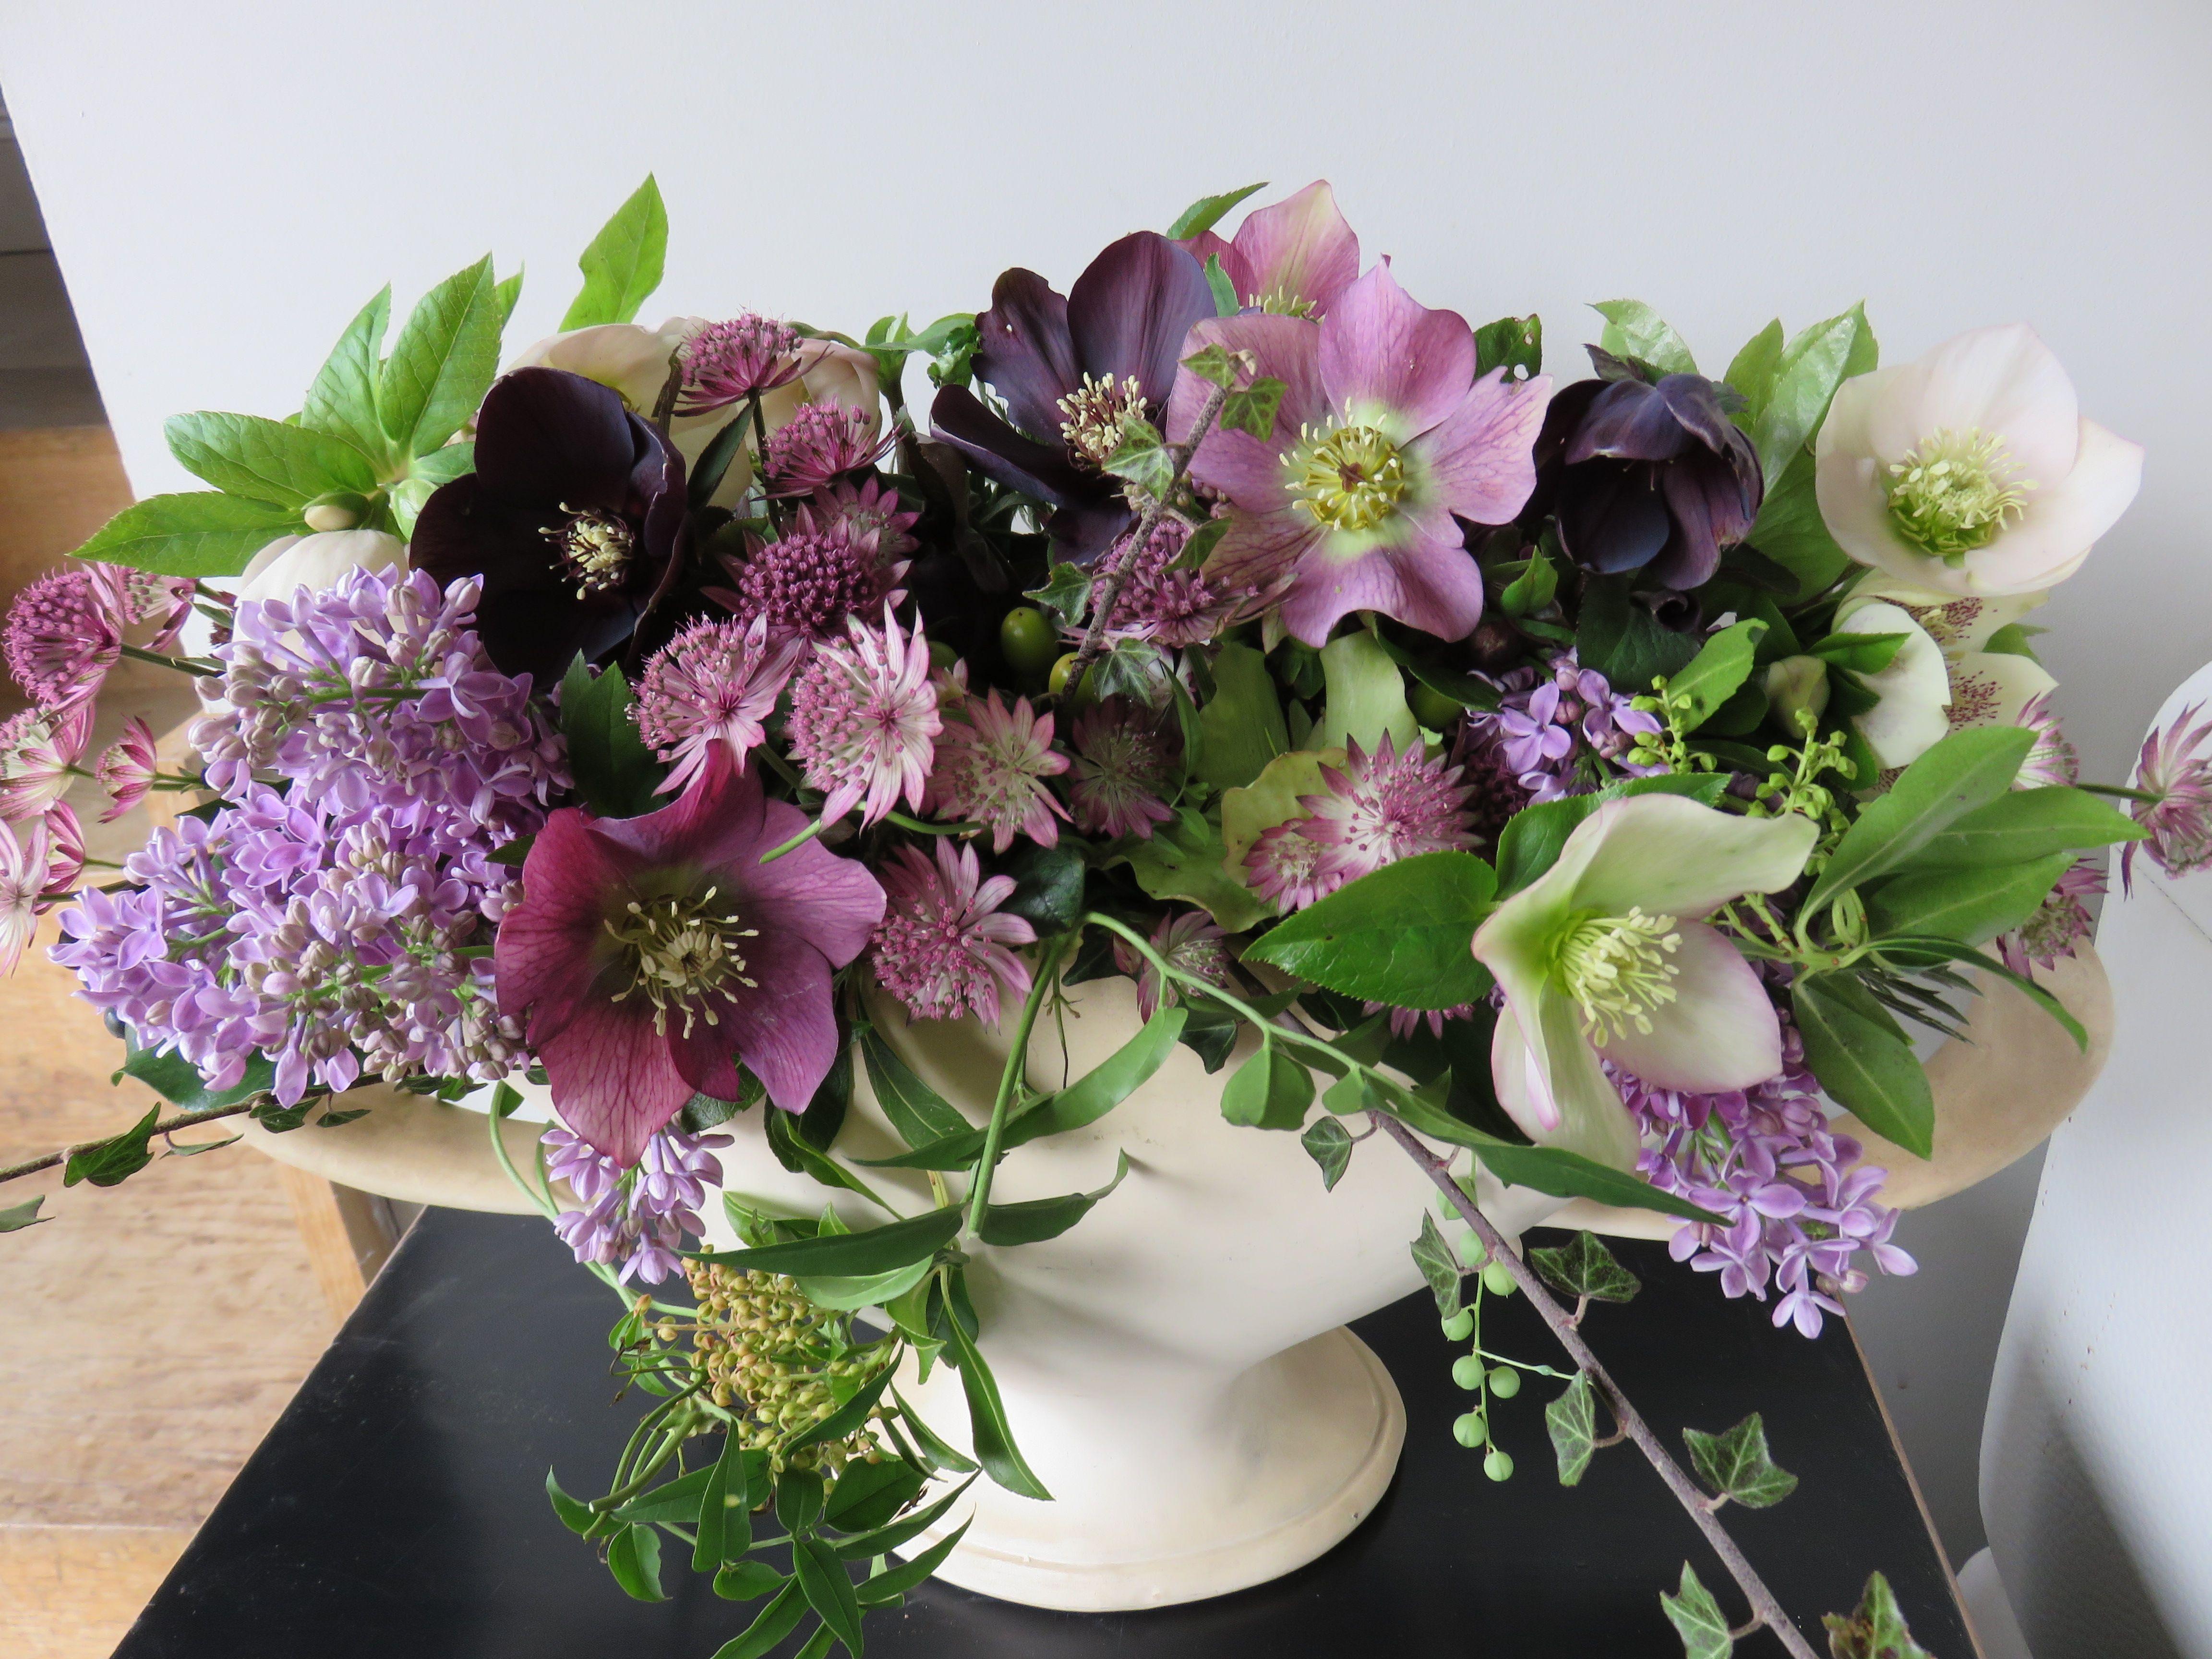 Vintage constance spry vase filled with spring lilacs and purple vintage constance spry vase filled with spring lilacs and purple hellebores reviewsmspy